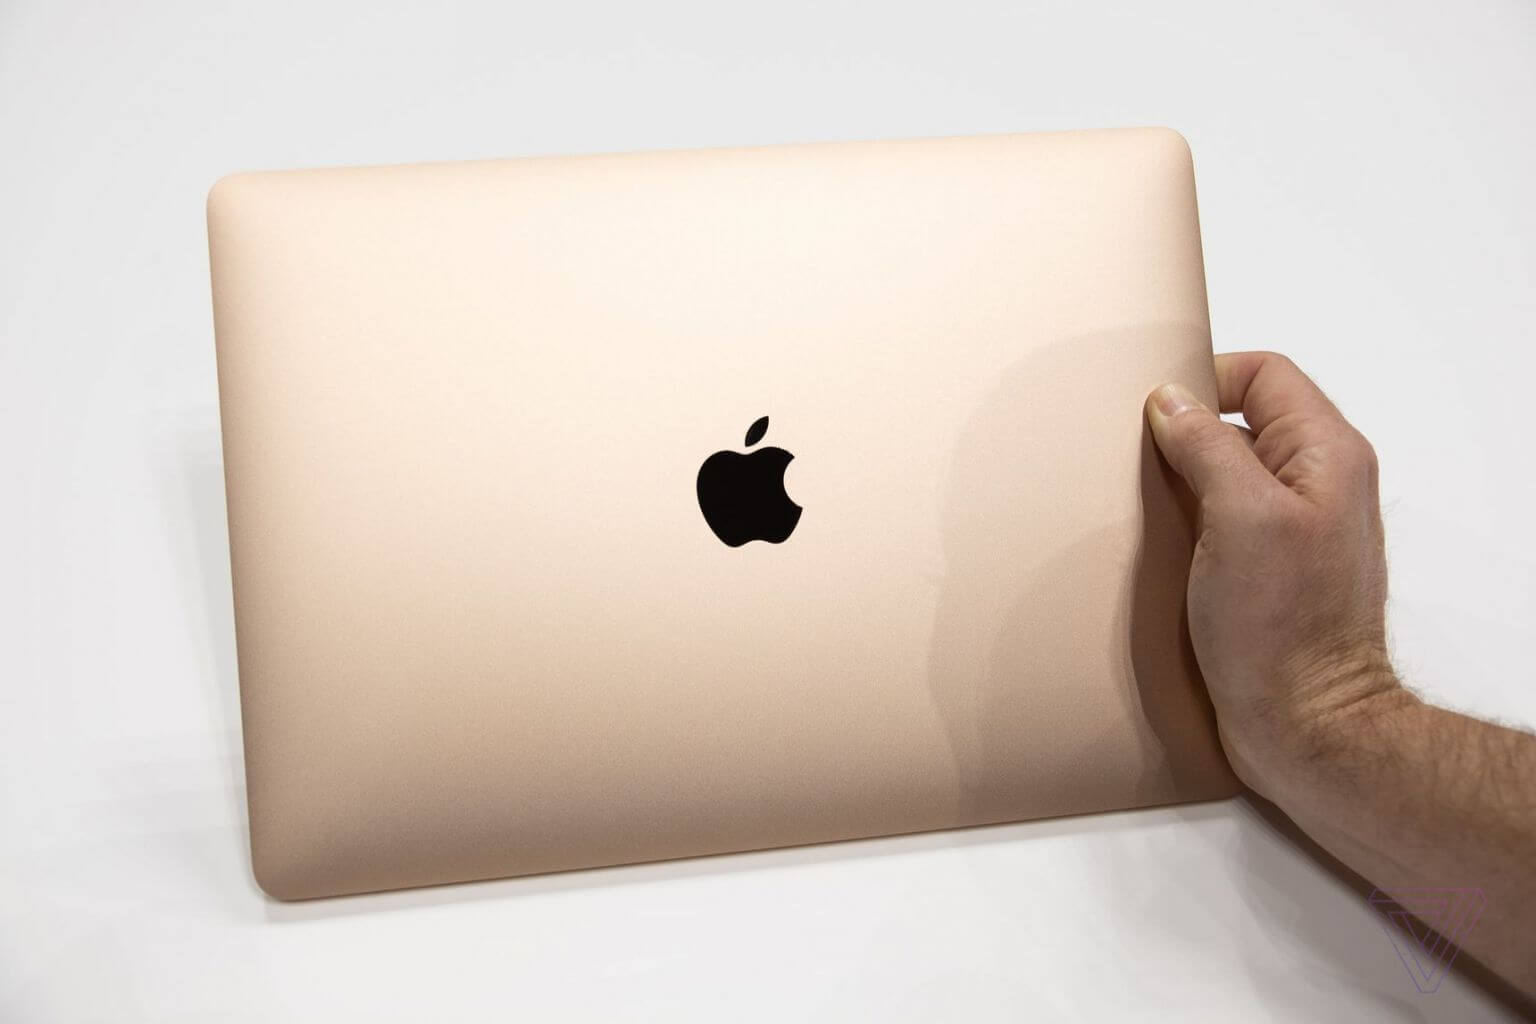 MacBook Air品质一流:加入T2芯片、超短键盘、高分辨率